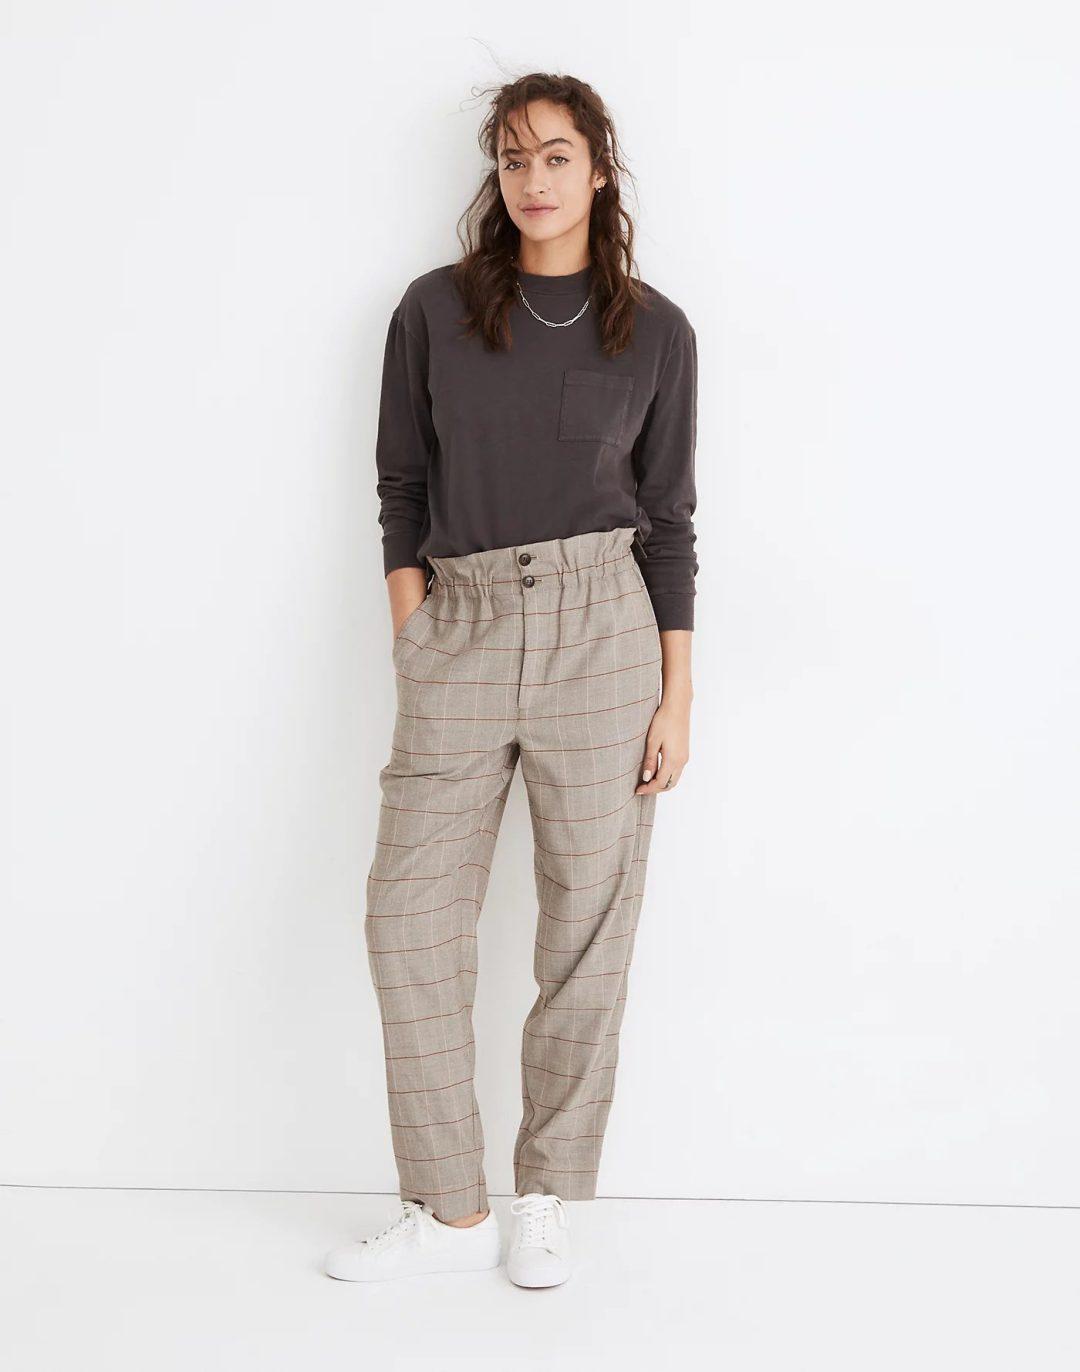 Tartan tailored pants with grey sweatshirt